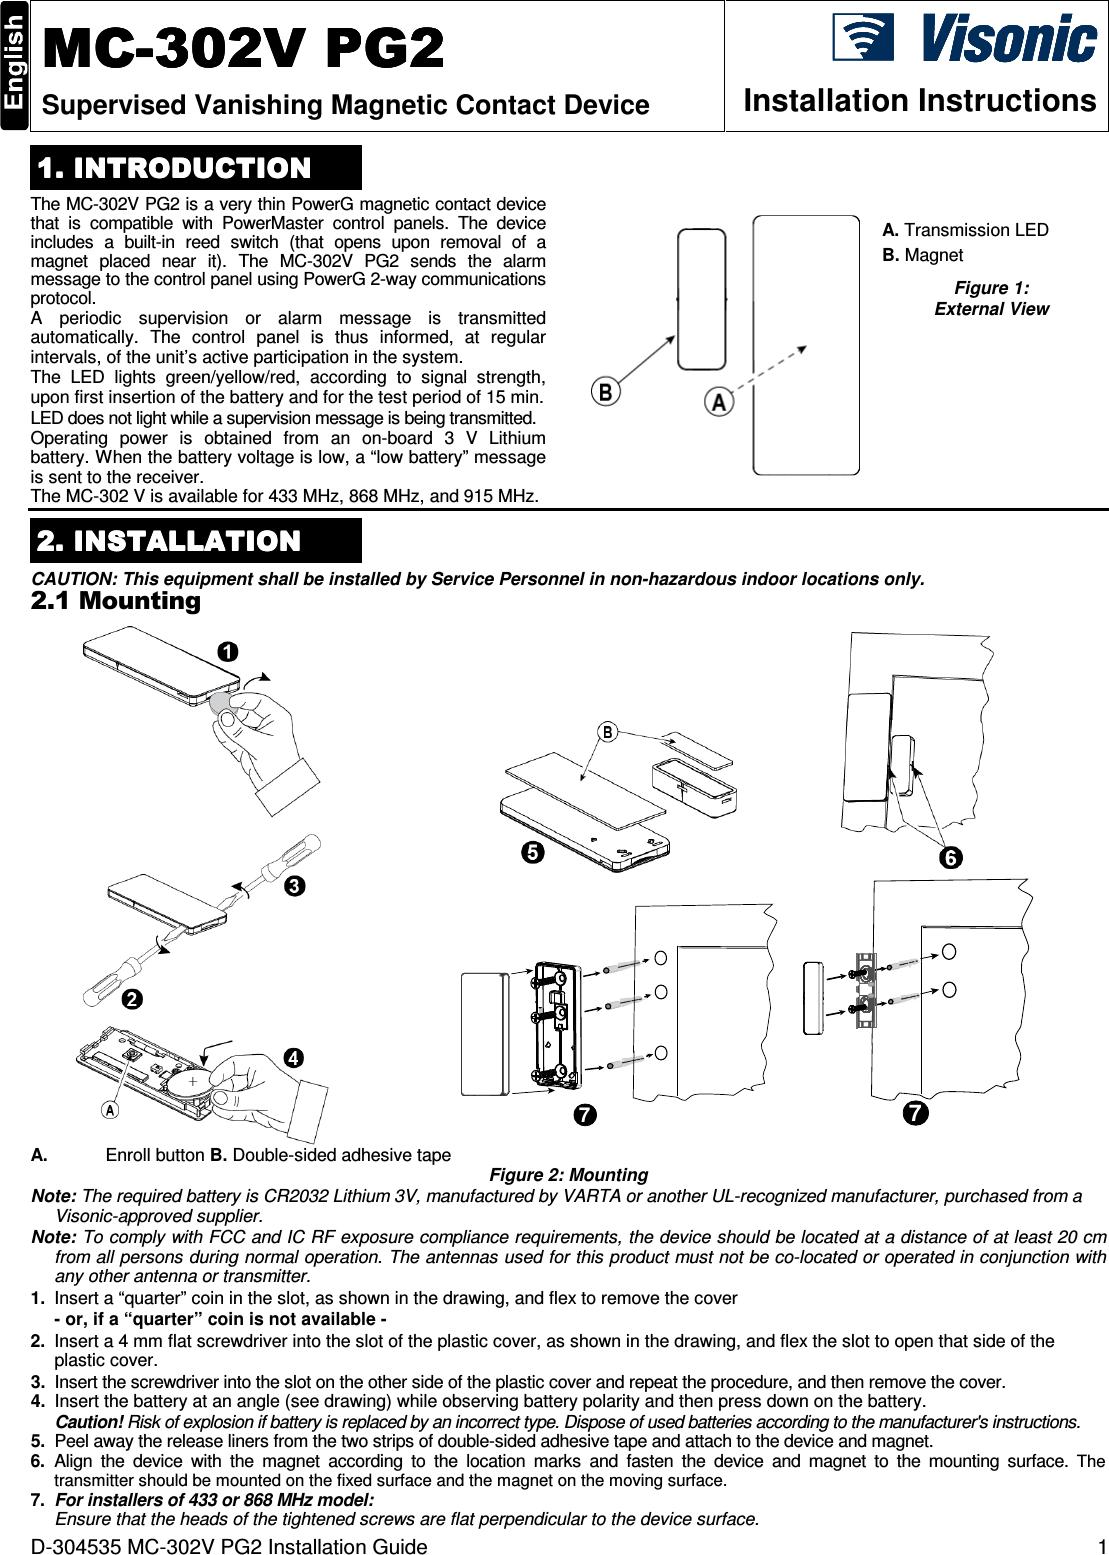 visonic mc302vpg2 vanishing magnetic contact device user manual d 304535 mc 302v pg2